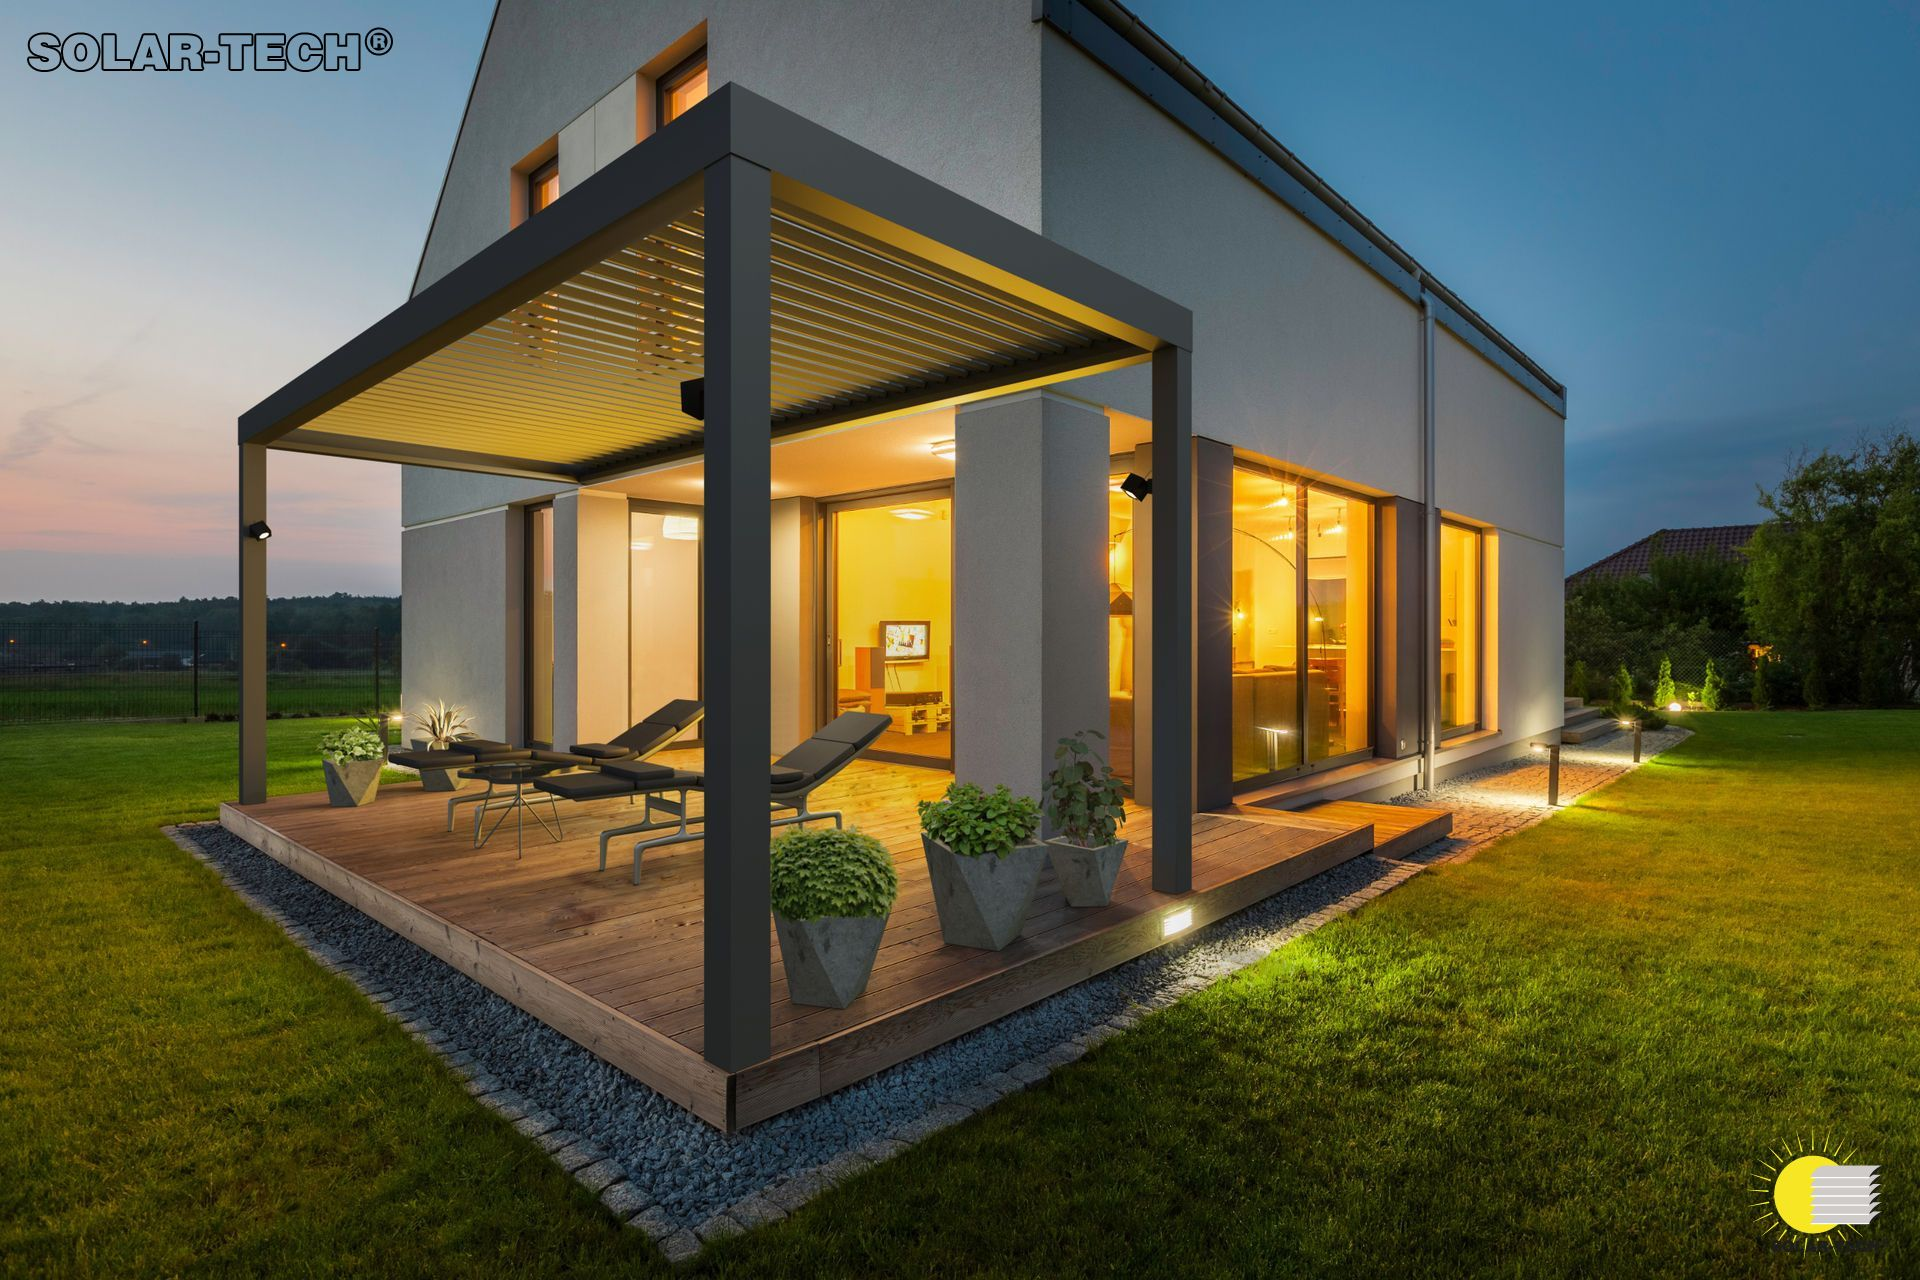 pergole primavera nowoczesne zadaszenie tarasu pro haus sczecin. Black Bedroom Furniture Sets. Home Design Ideas